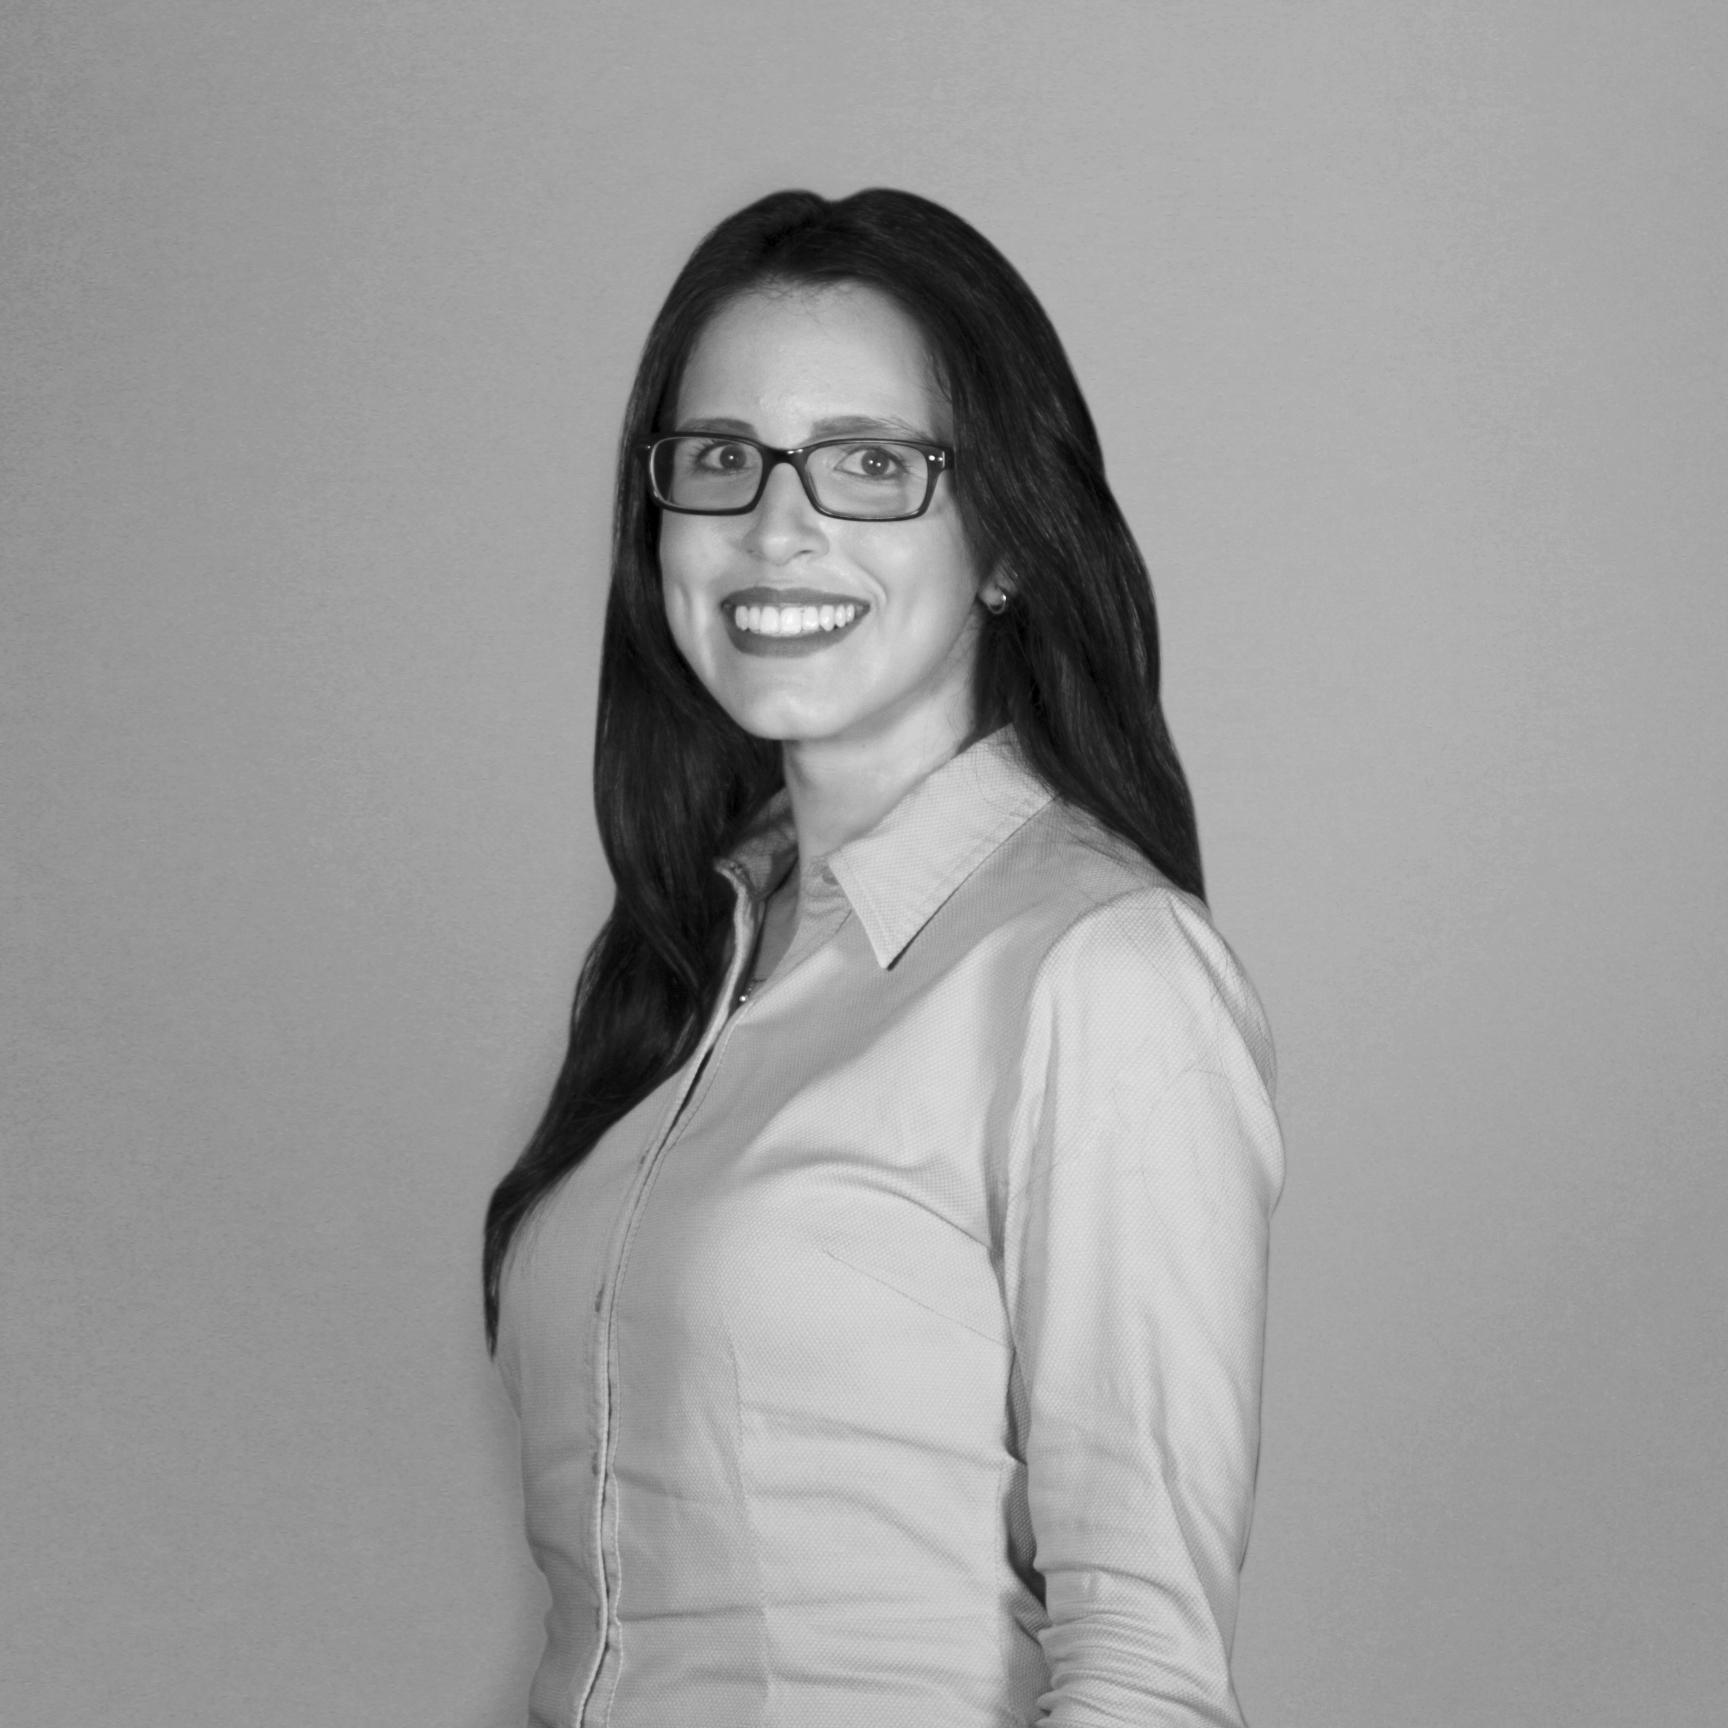 Ana Luiza Kubiça Pavão Espindola